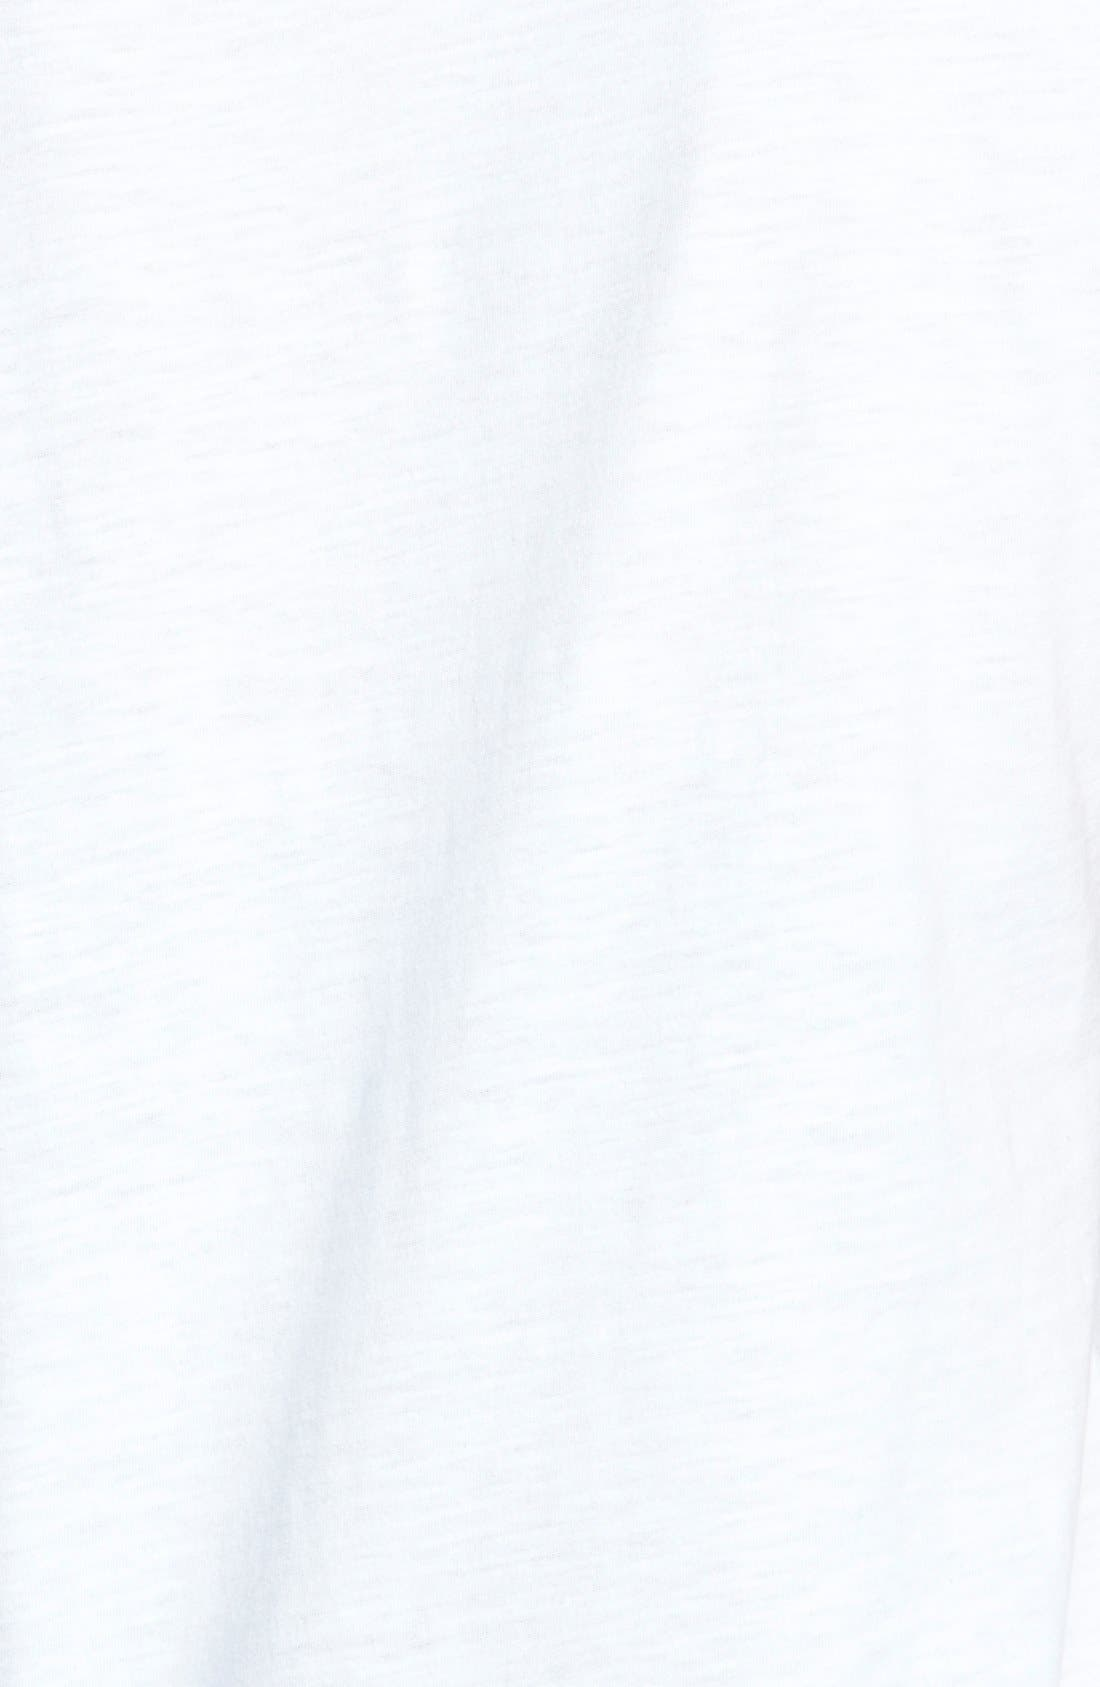 Alternate Image 3  - Eileen Fisher Organic Cotton Scoop Neck Tee (Online Only)